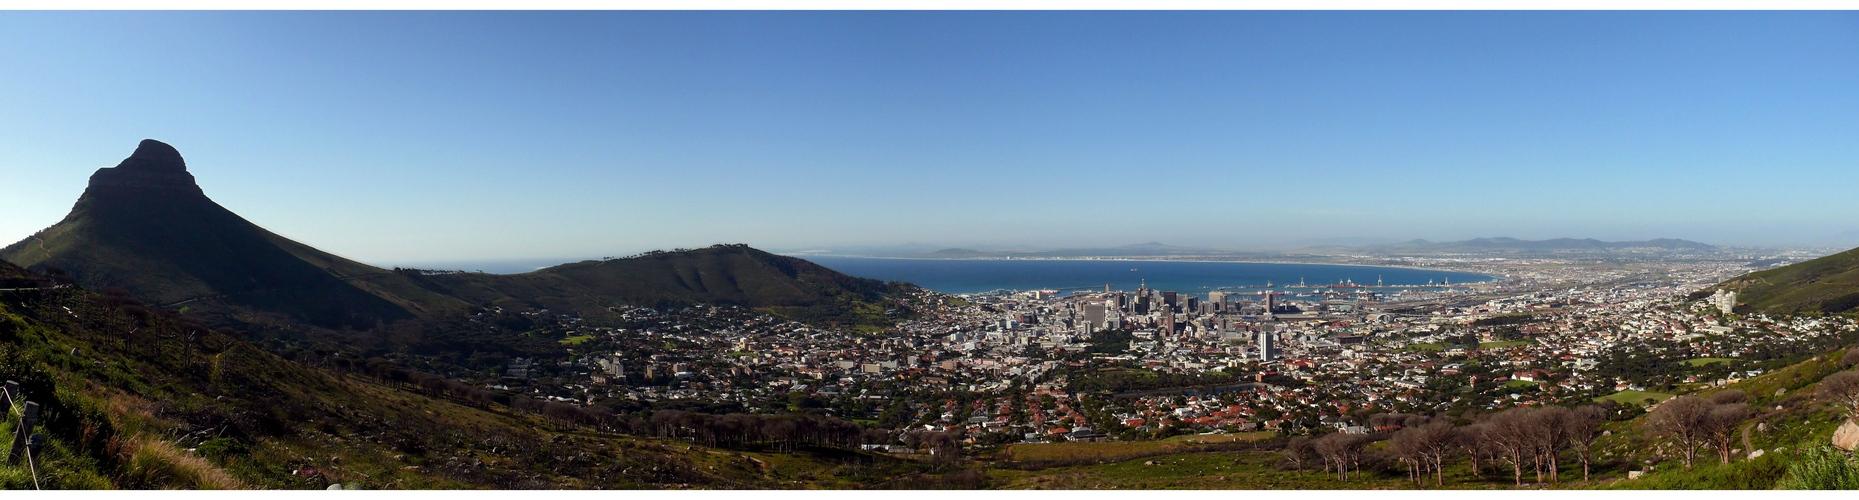 Cape Town Pano II